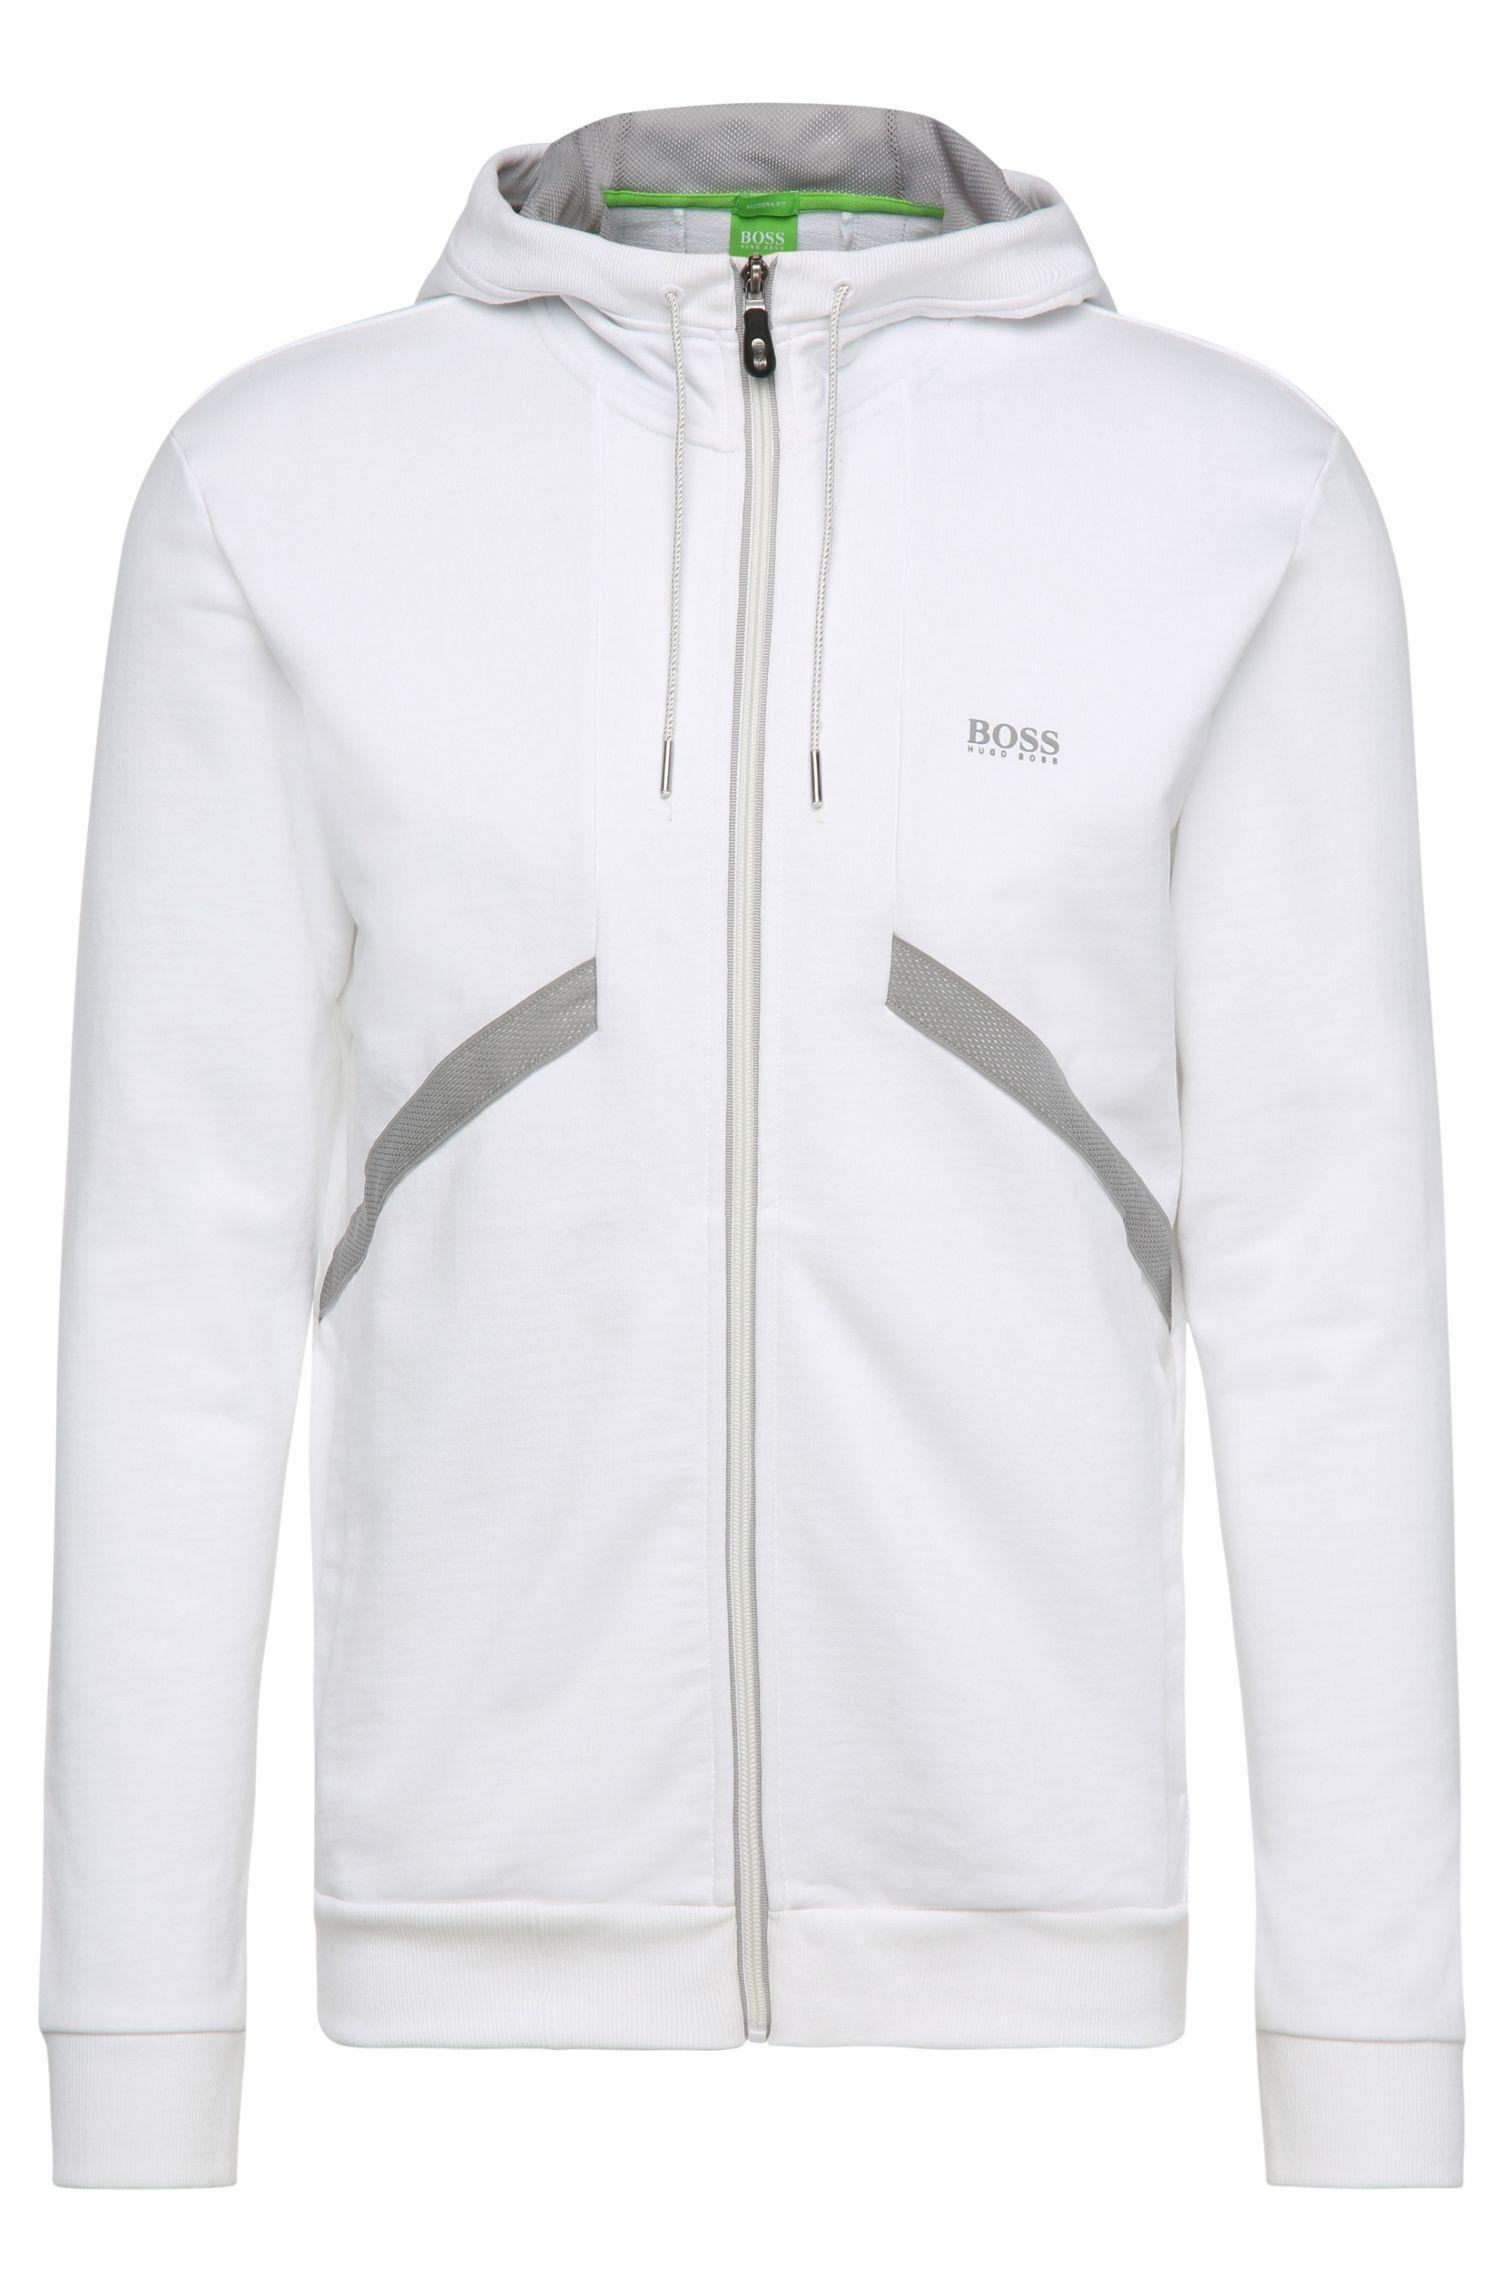 Kapuzen-Sweatshirt-Jacke aus Baumwolle ´Saggy 1`